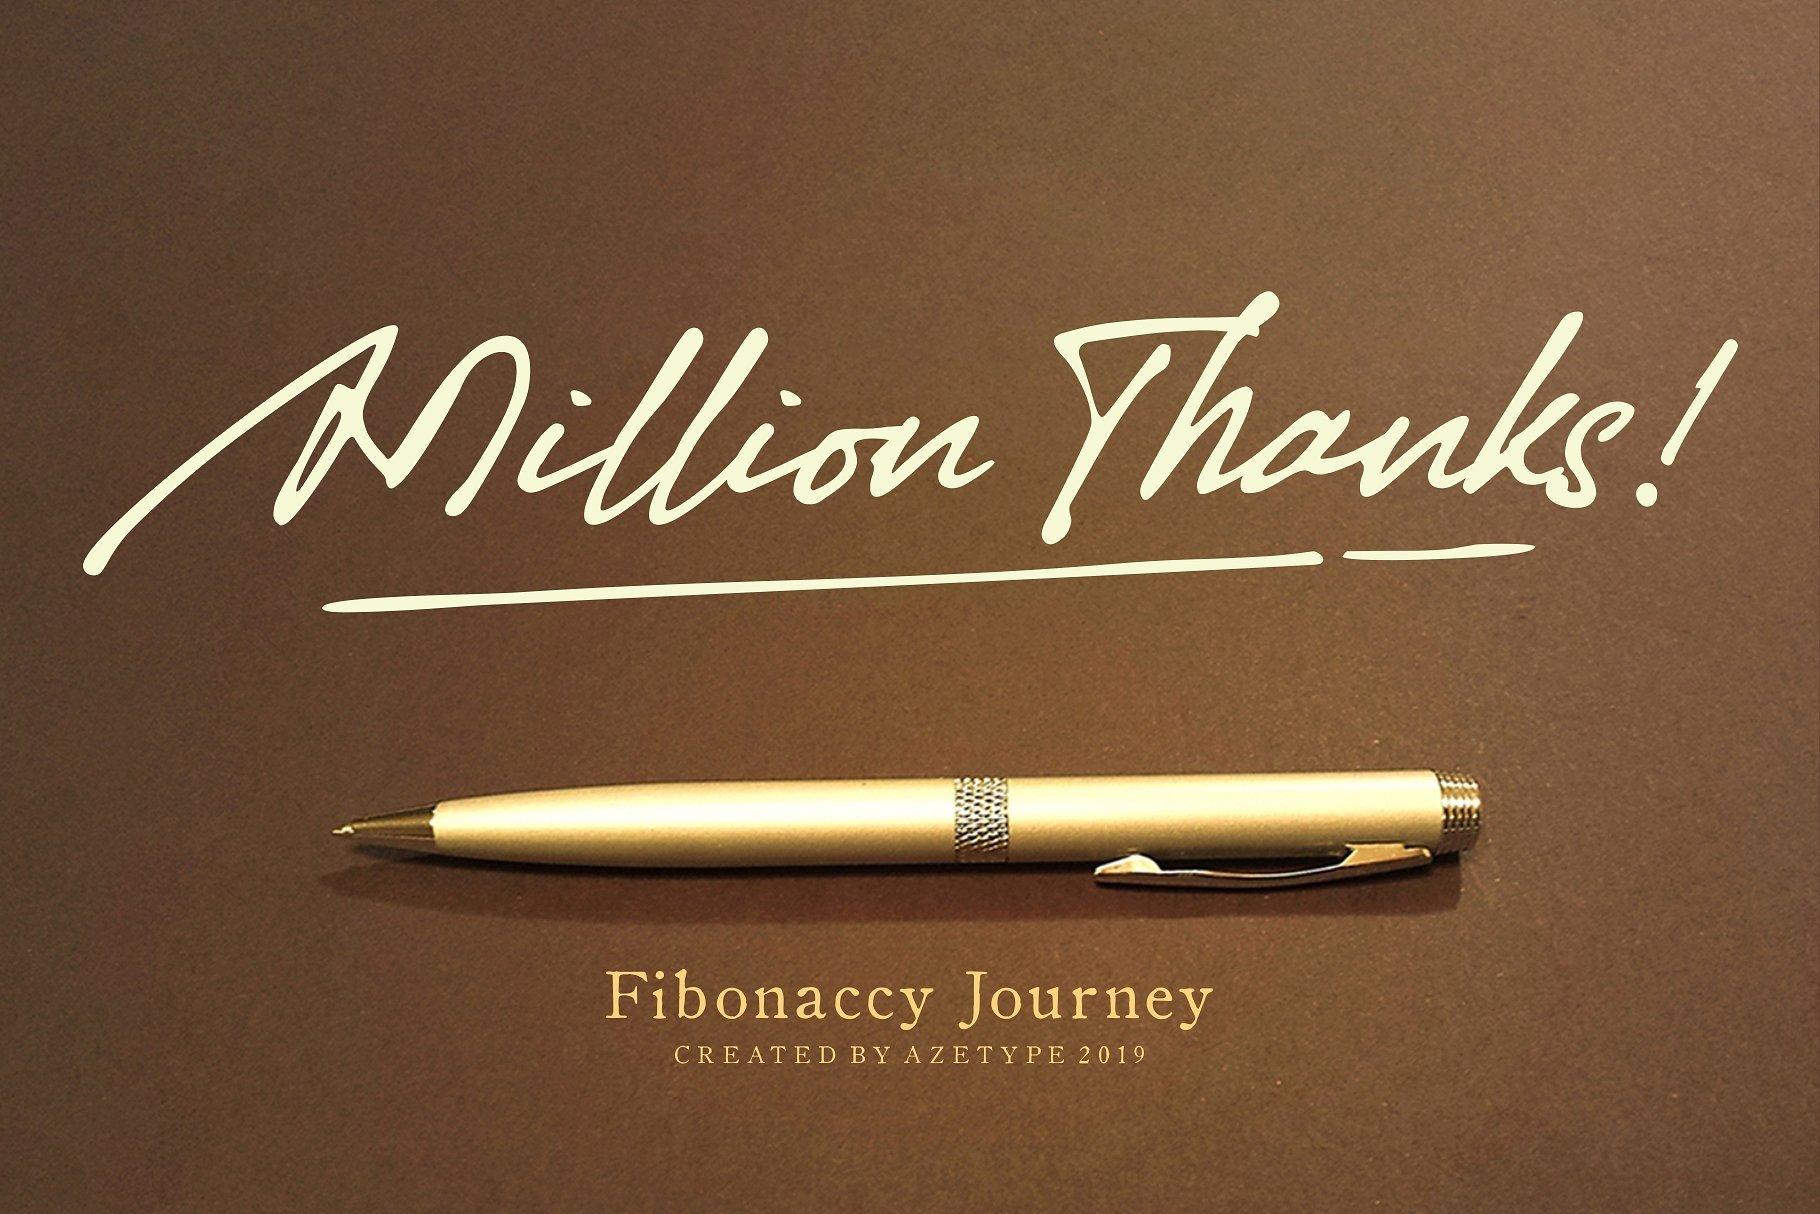 https://fontclarity.com/wp-content/uploads/2019/09/fibonaccy-journey-script-font-download-0.jpg Free Download